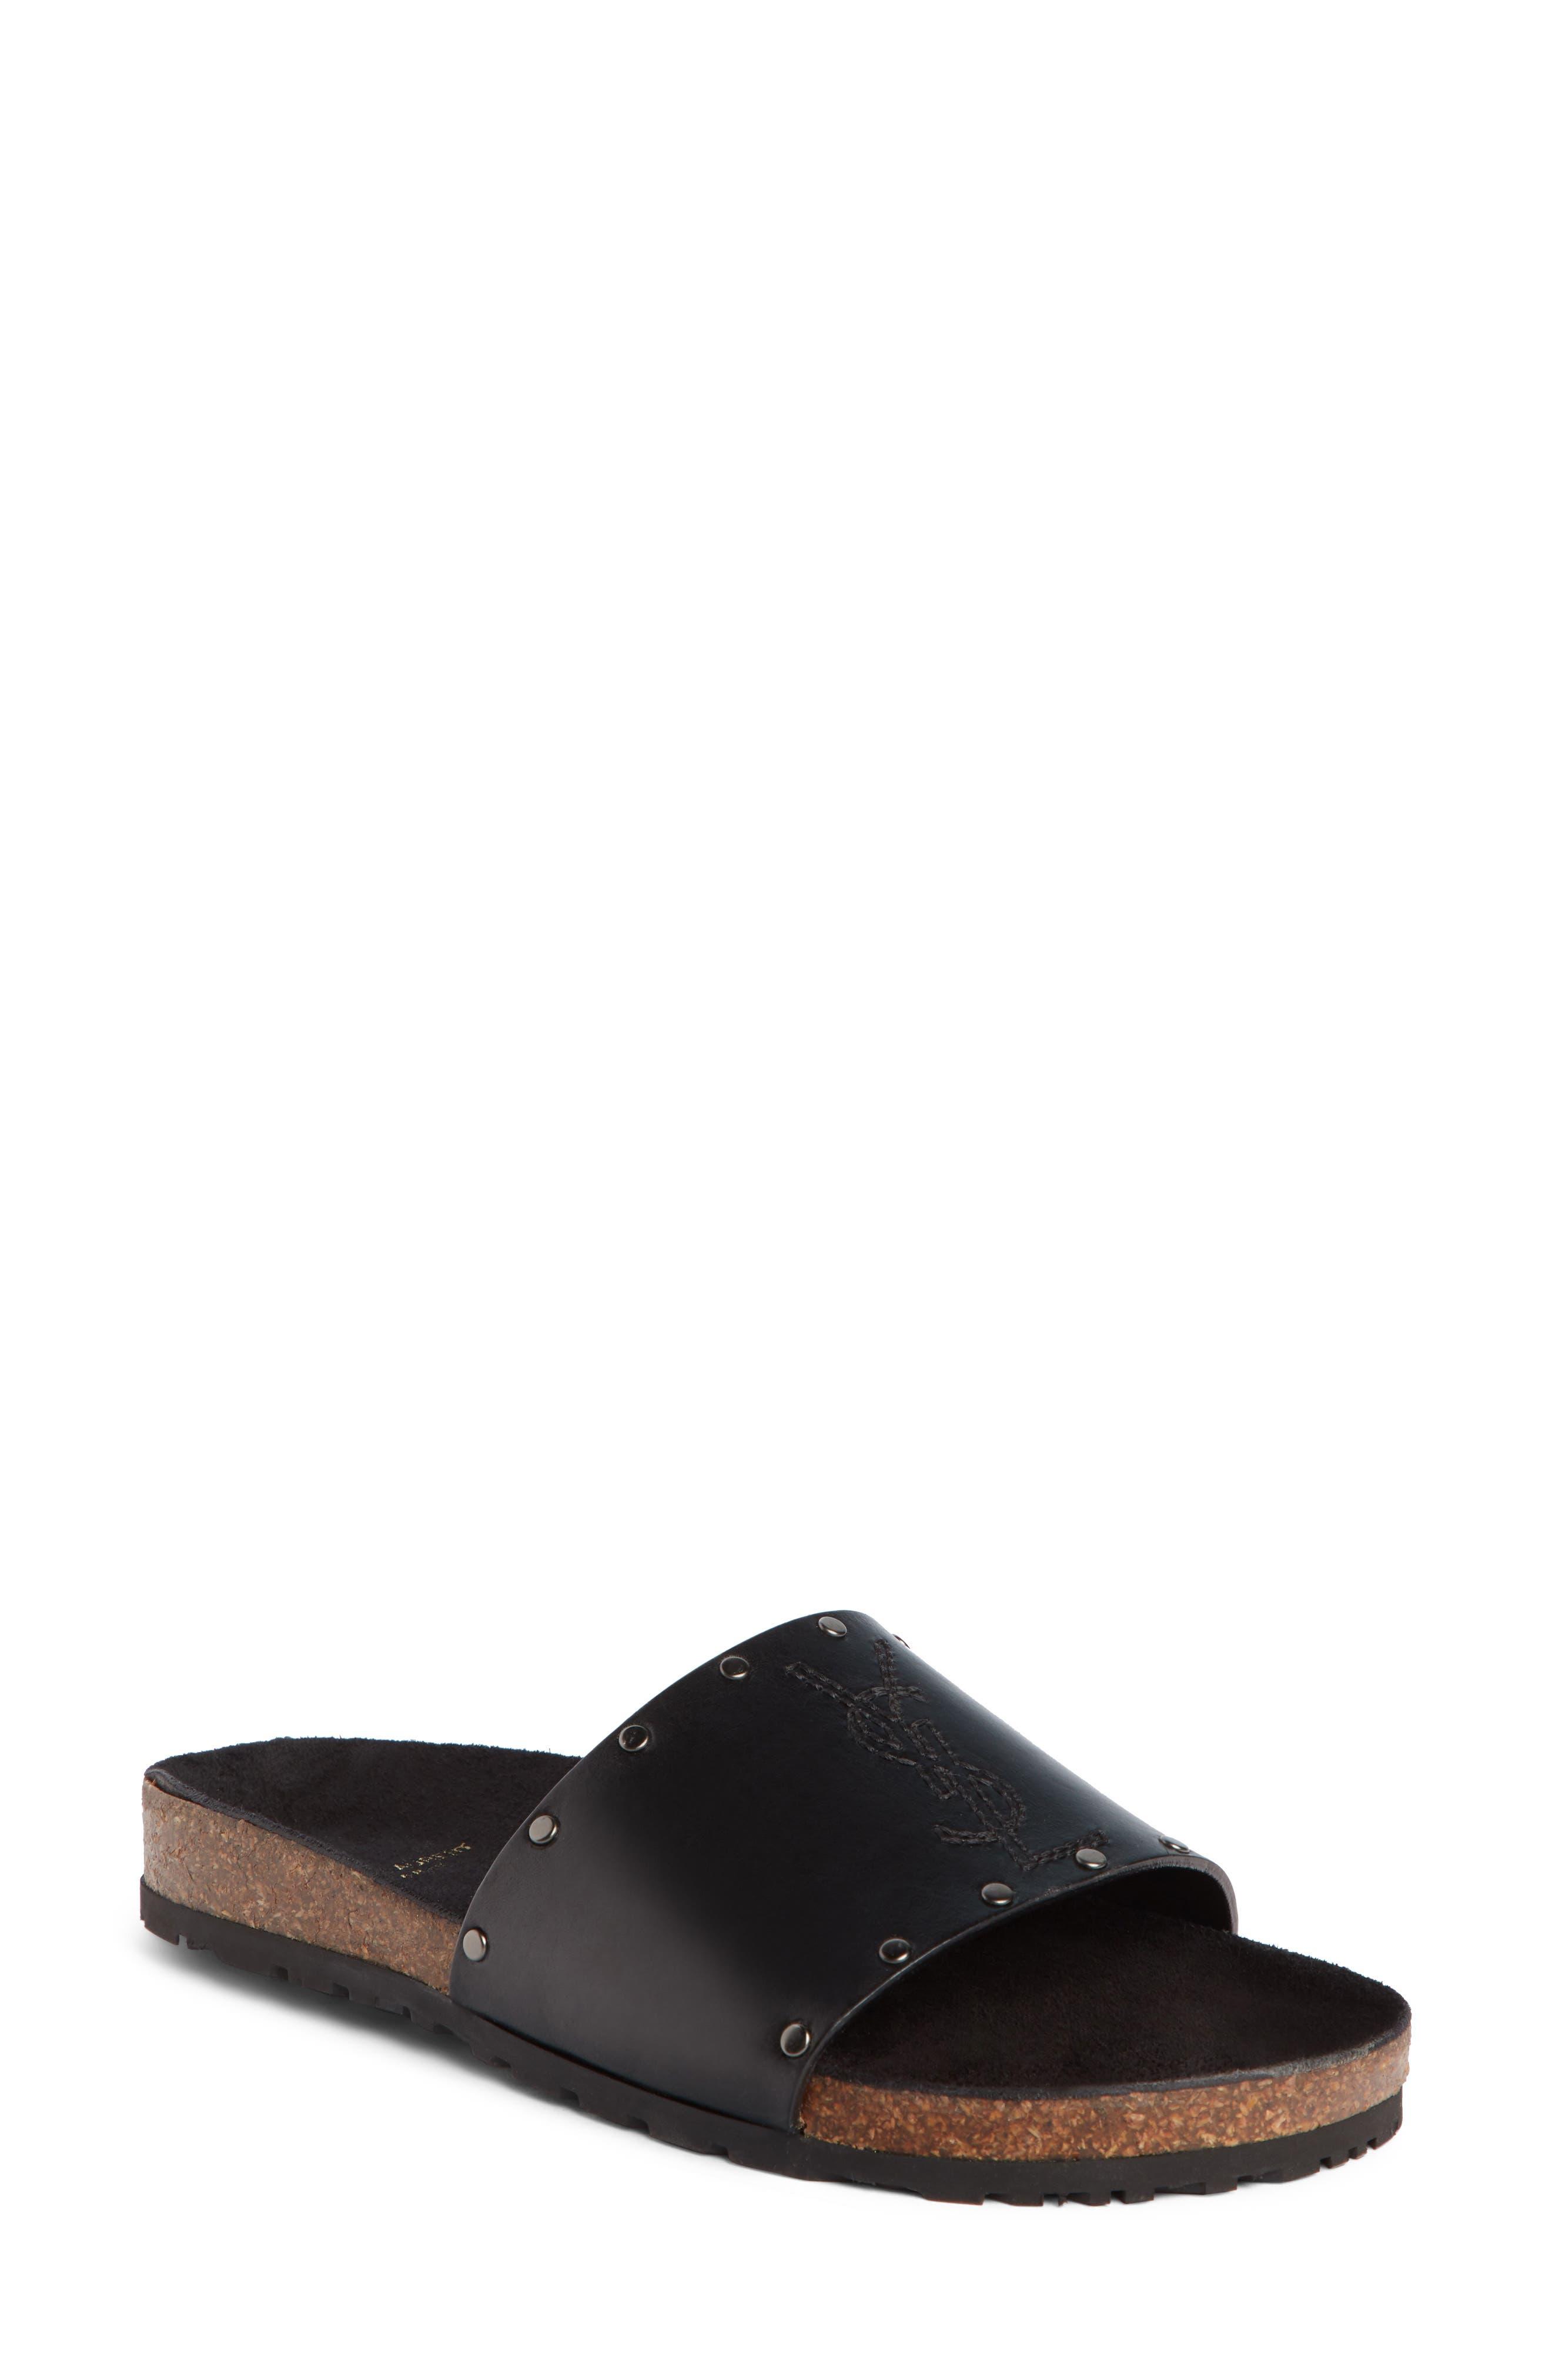 Saint Laurent Jimmy Logo Stud Slide Sandal, Black